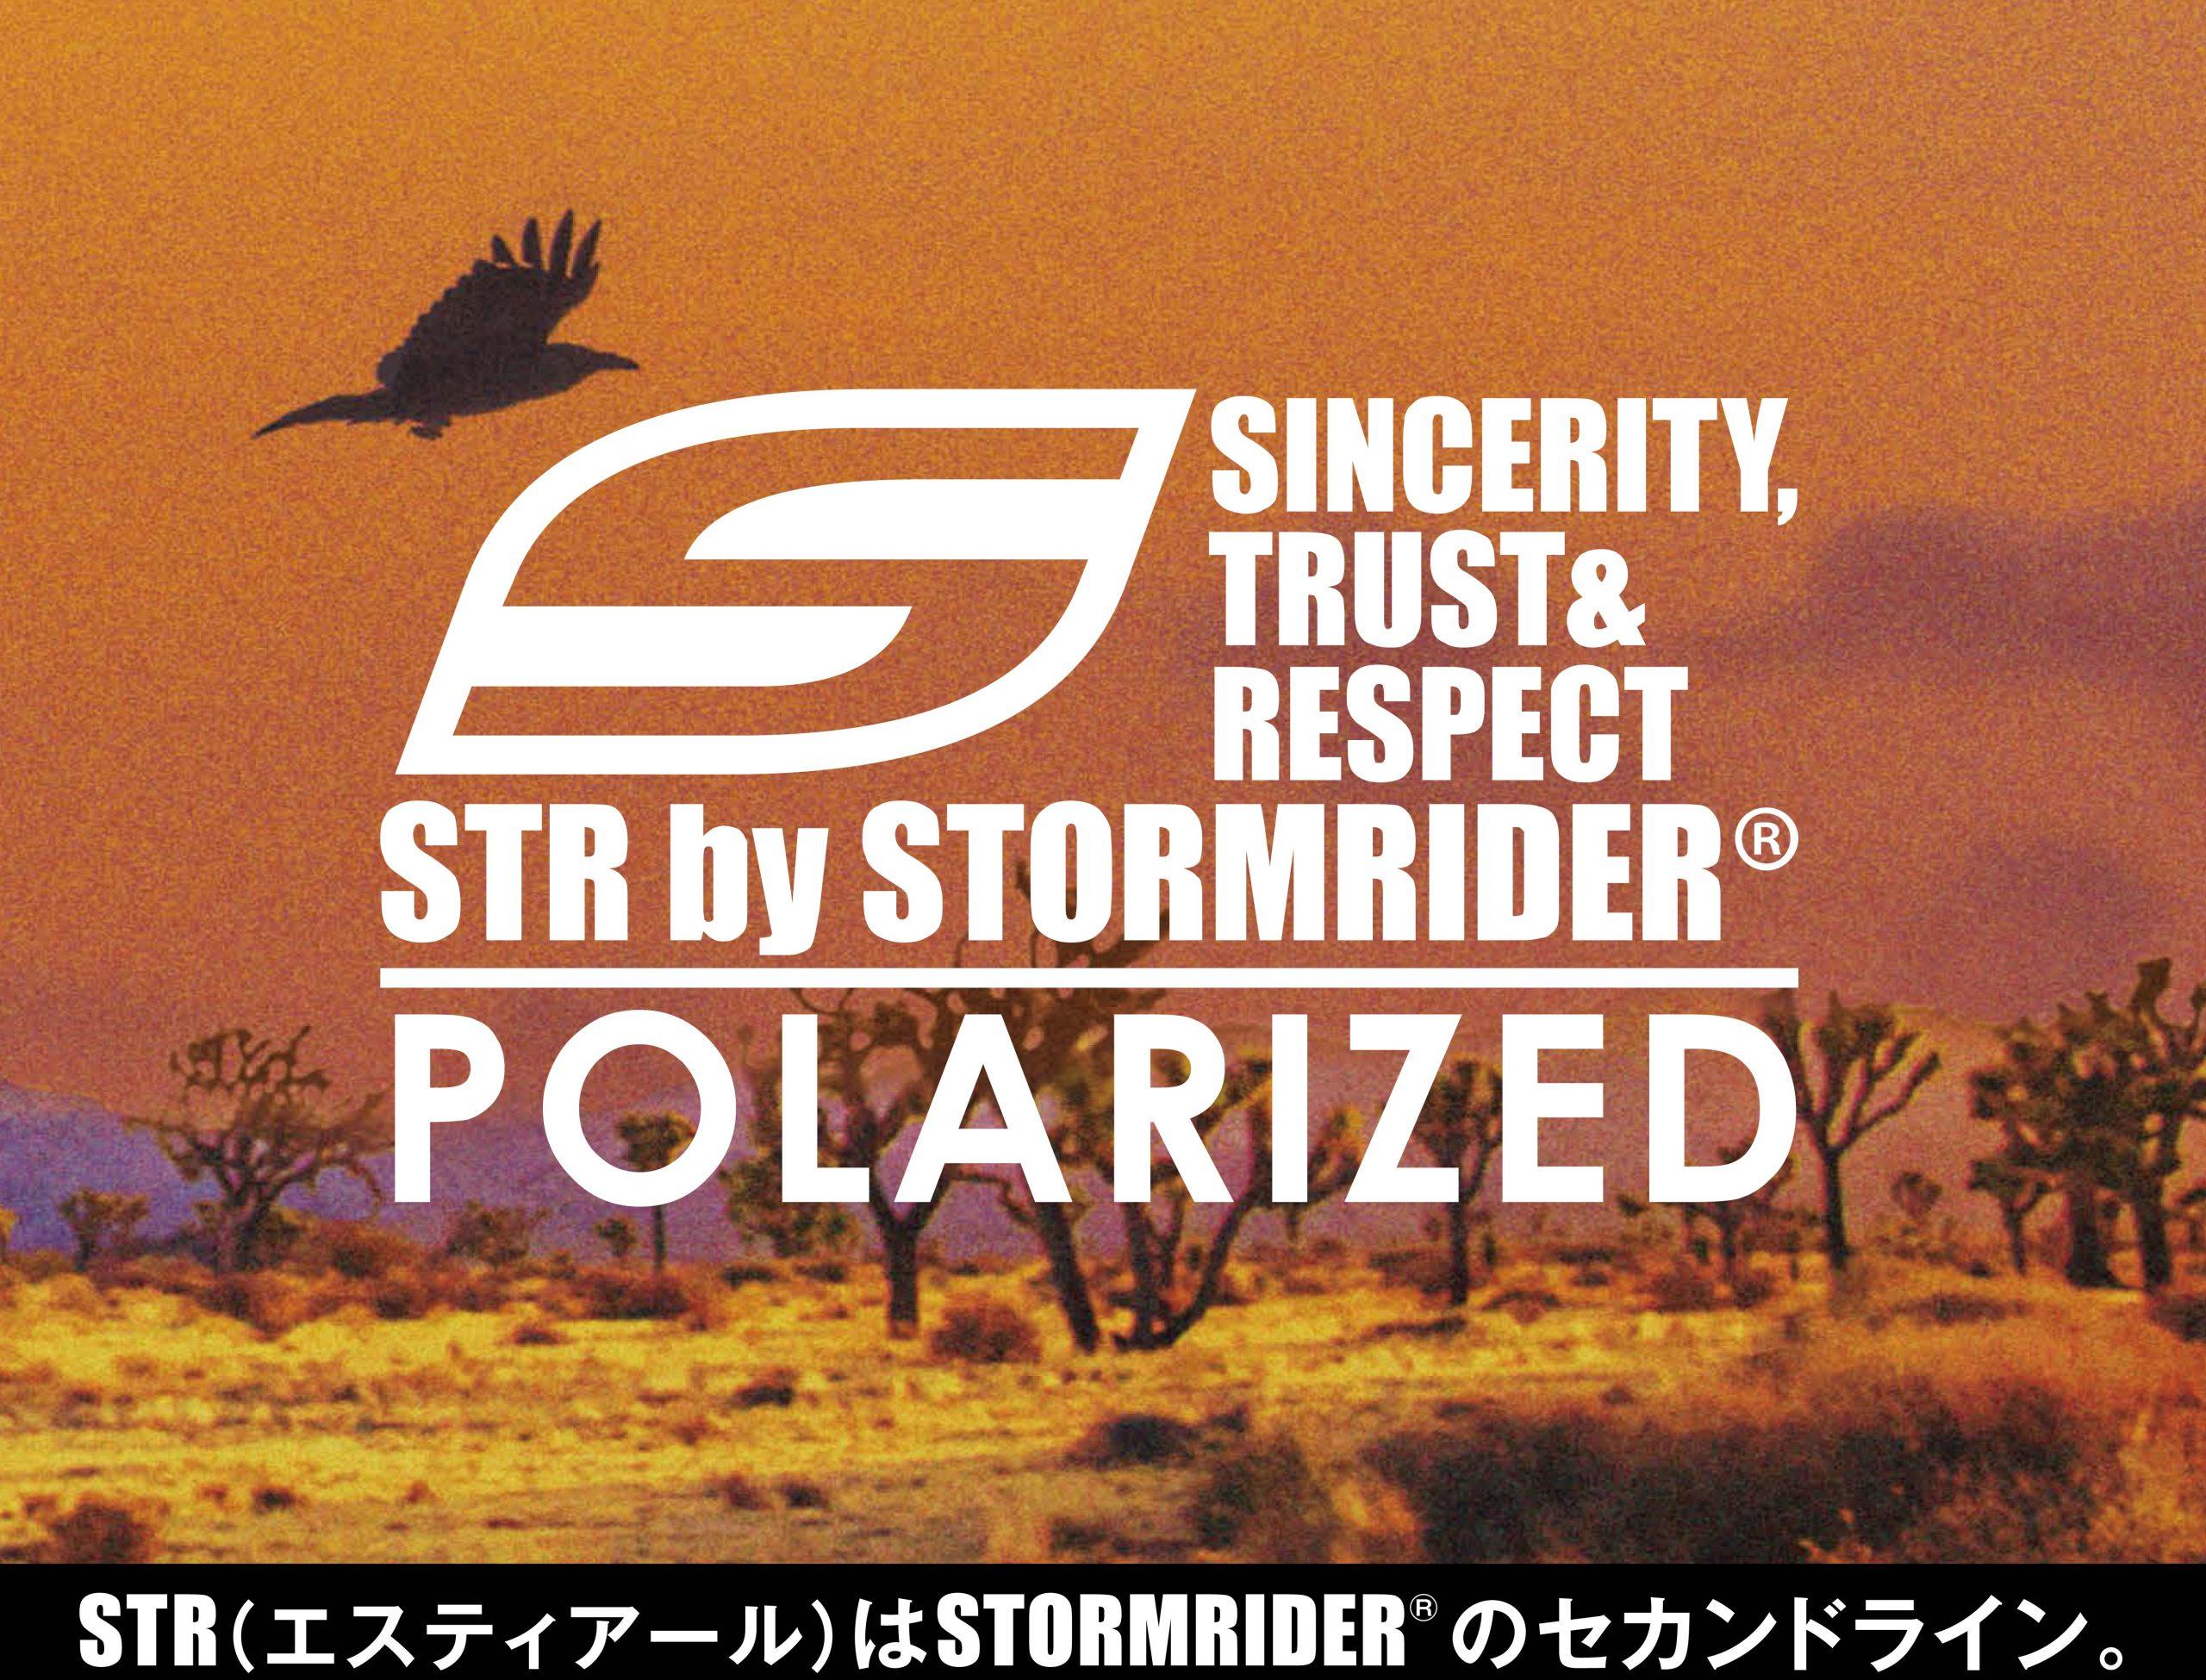 STR by stormrider®(エスティアール)